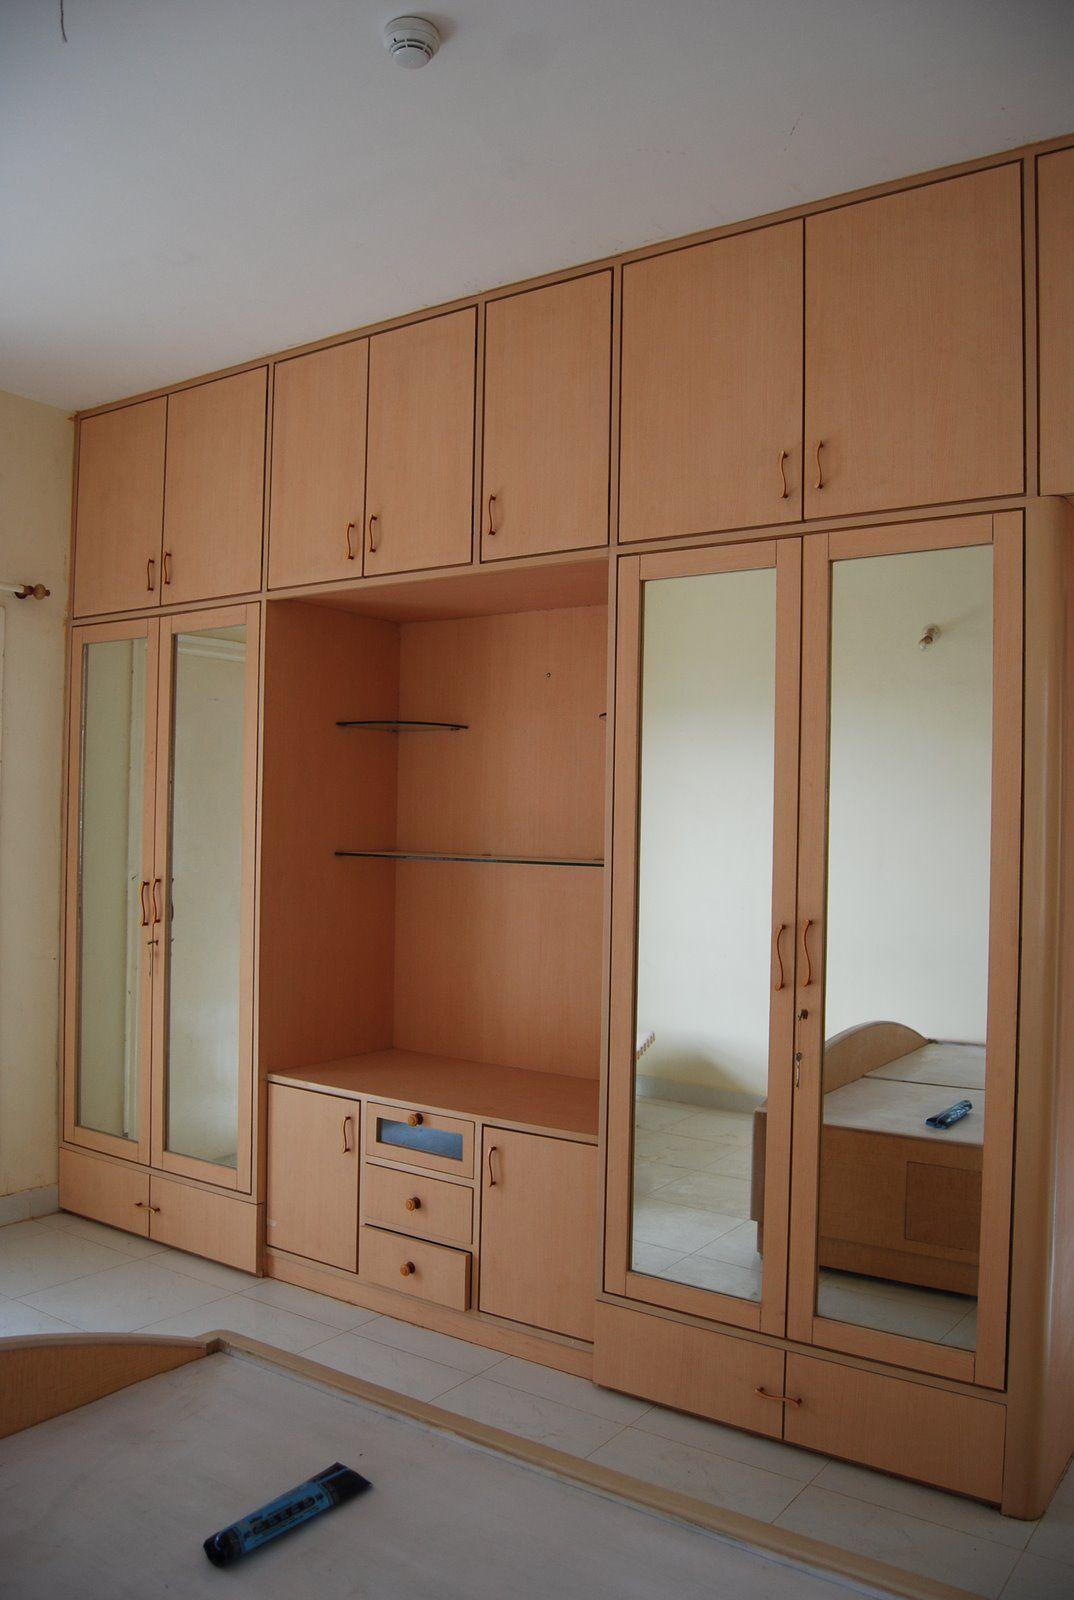 Bedroom Furnitures Wardrobe Dressing Table Almirah Cot Wardrobe